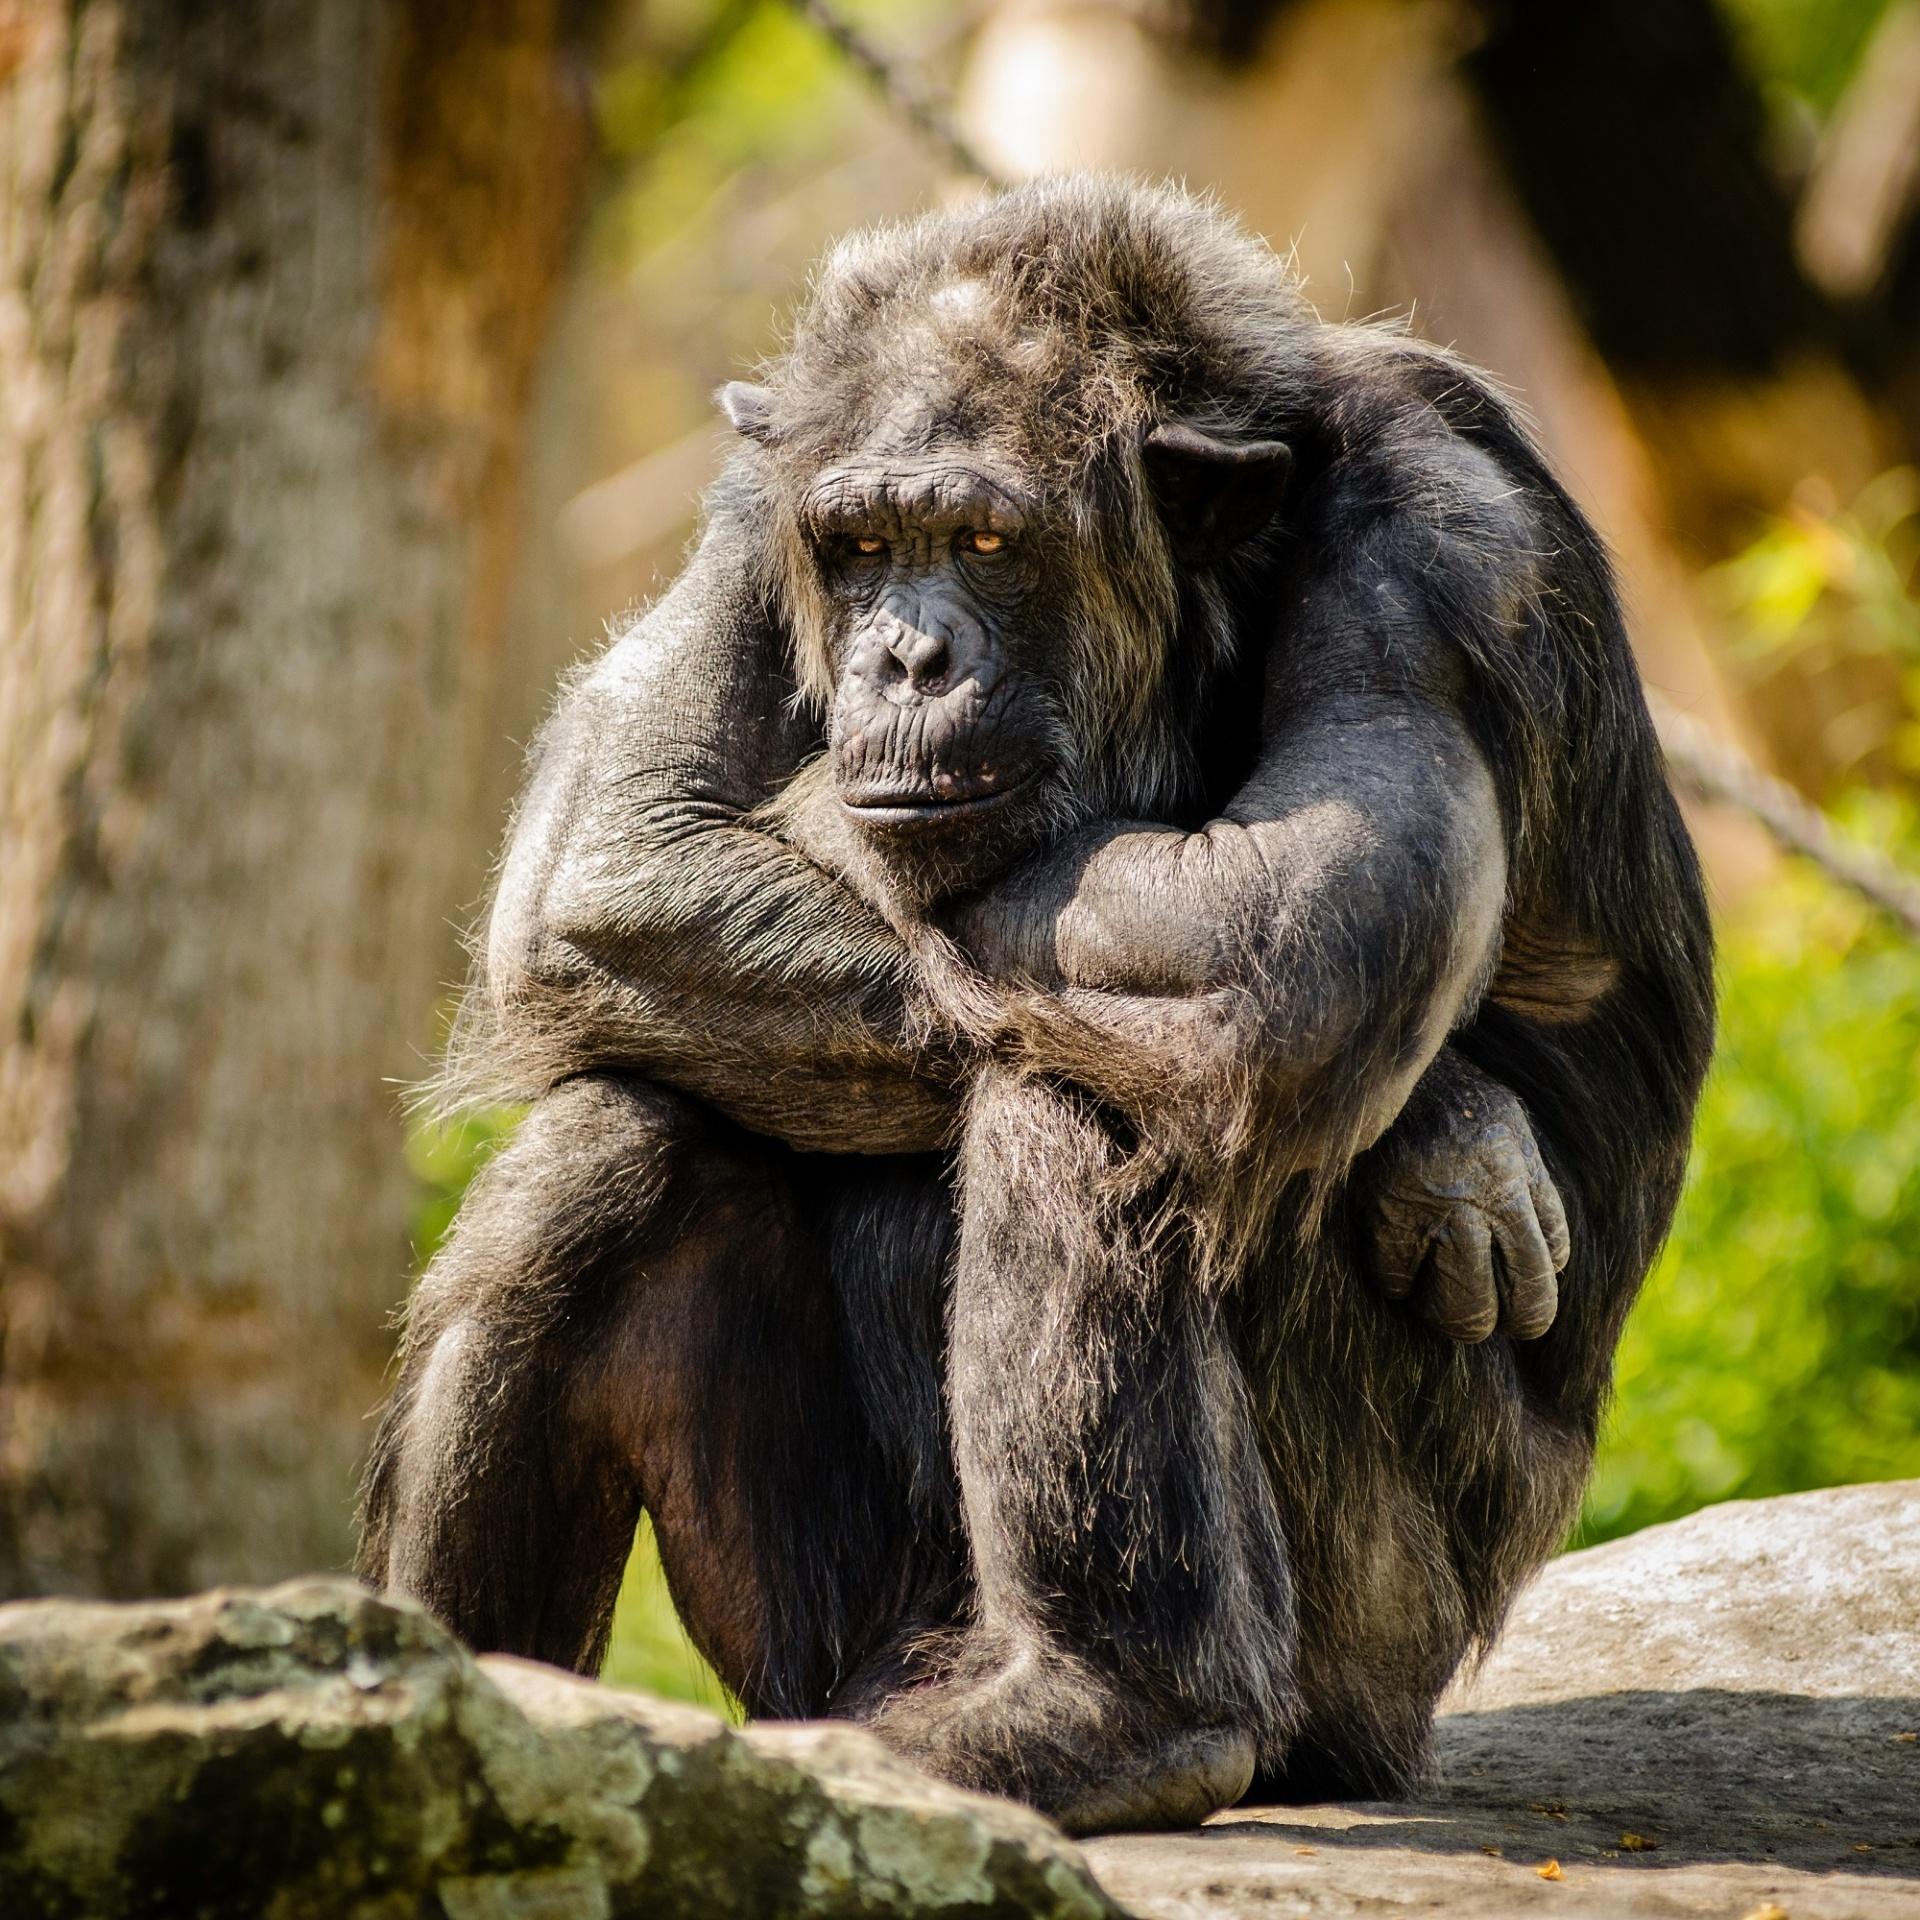 Chimp, Animal, Jungle